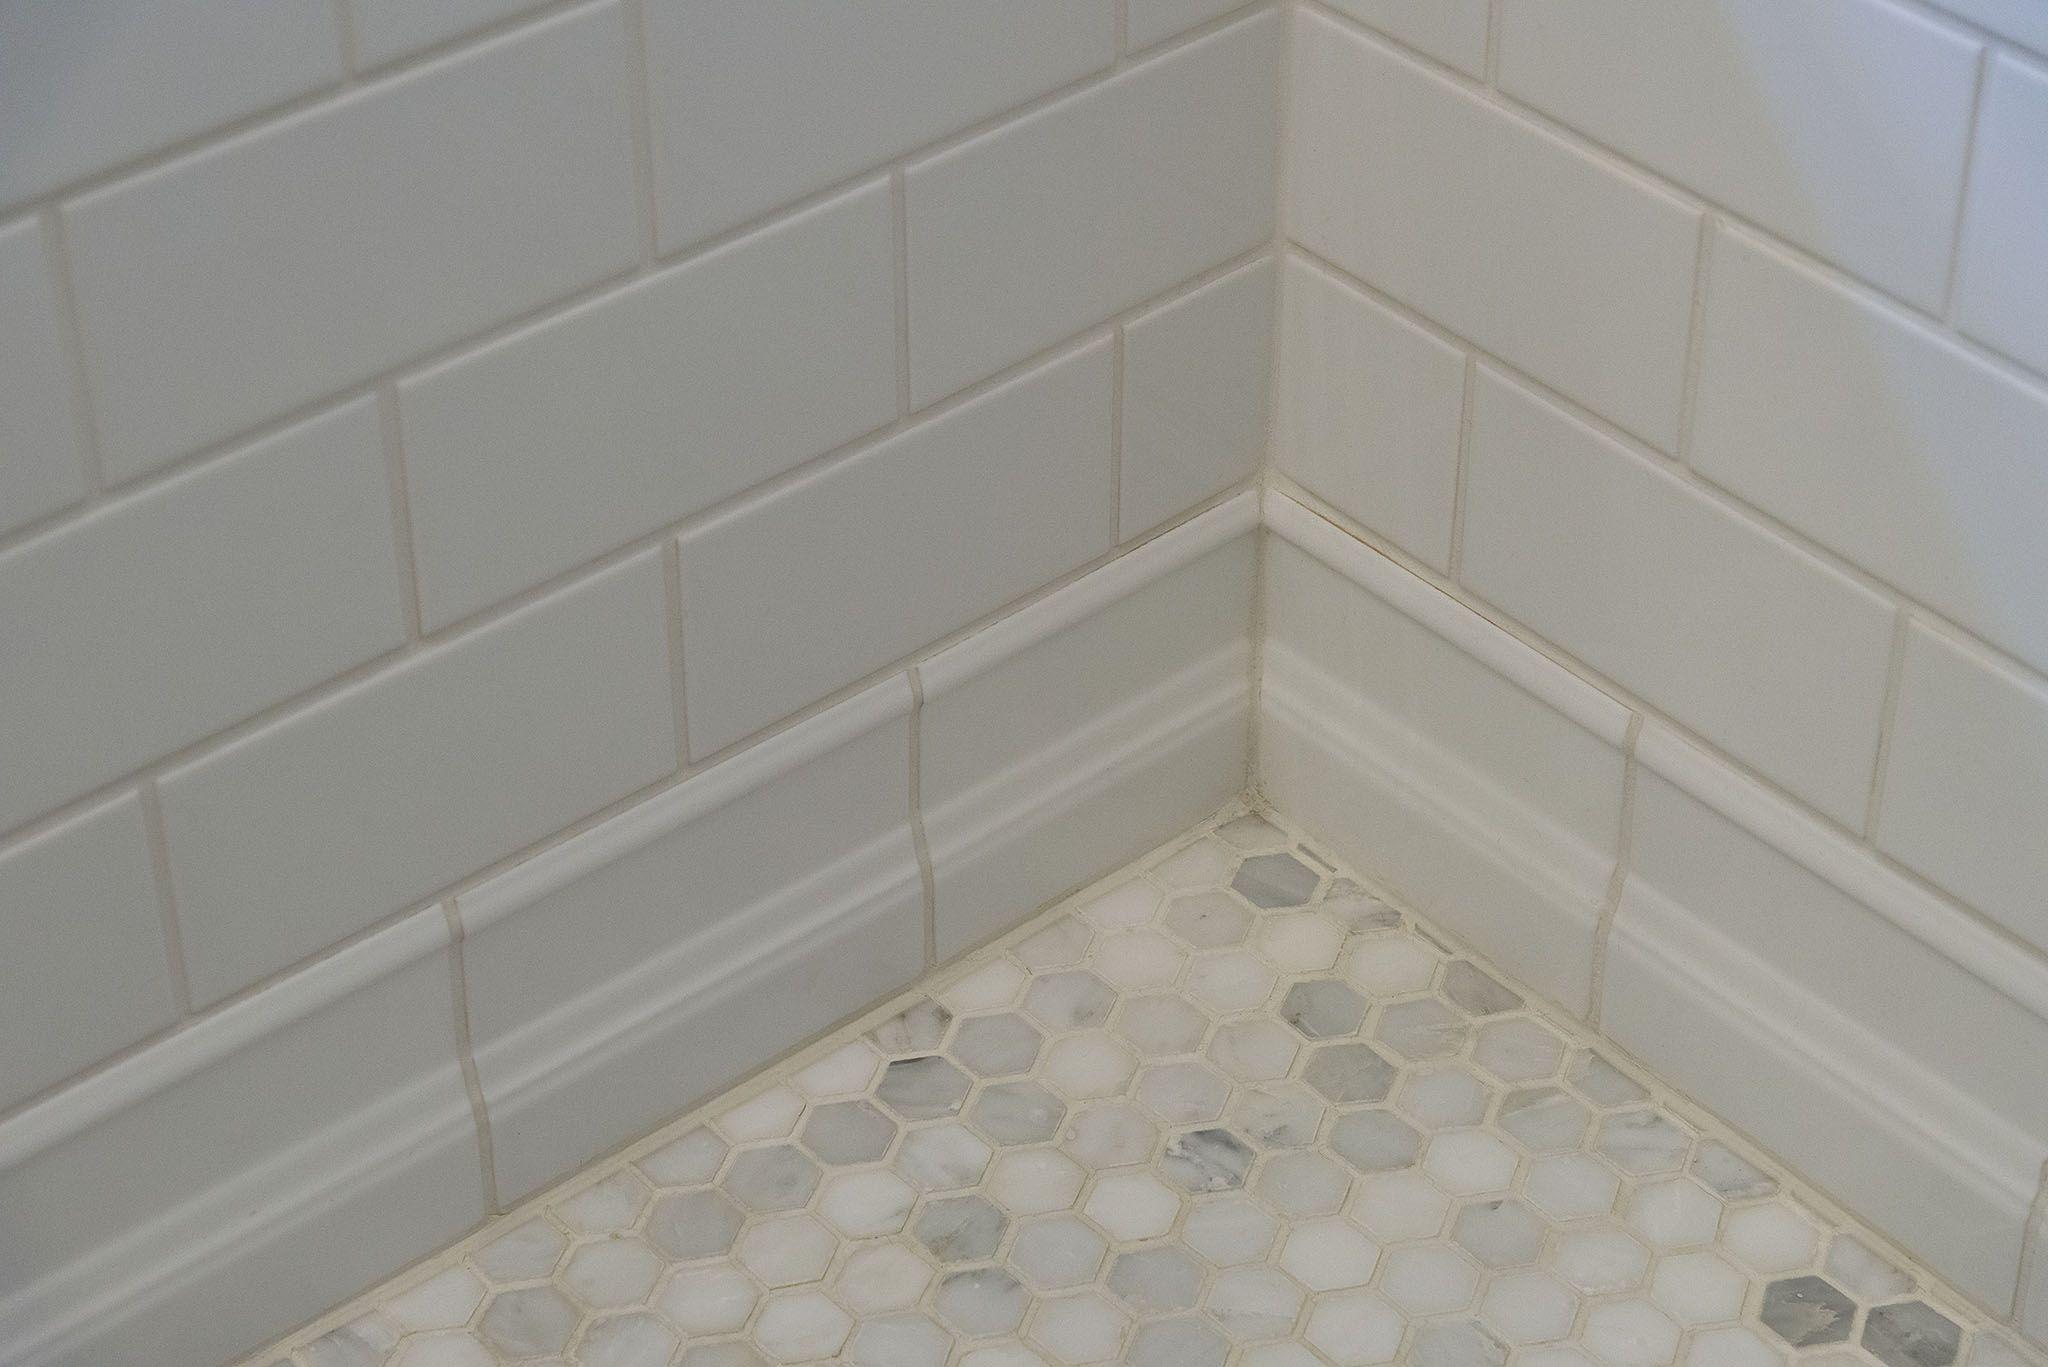 Guest Bathroom Hexagon Mosaic Floor White 3x6 Subway Tile And Tile Baseboard Tile Baseboard Bathroom Gallery Bathroom